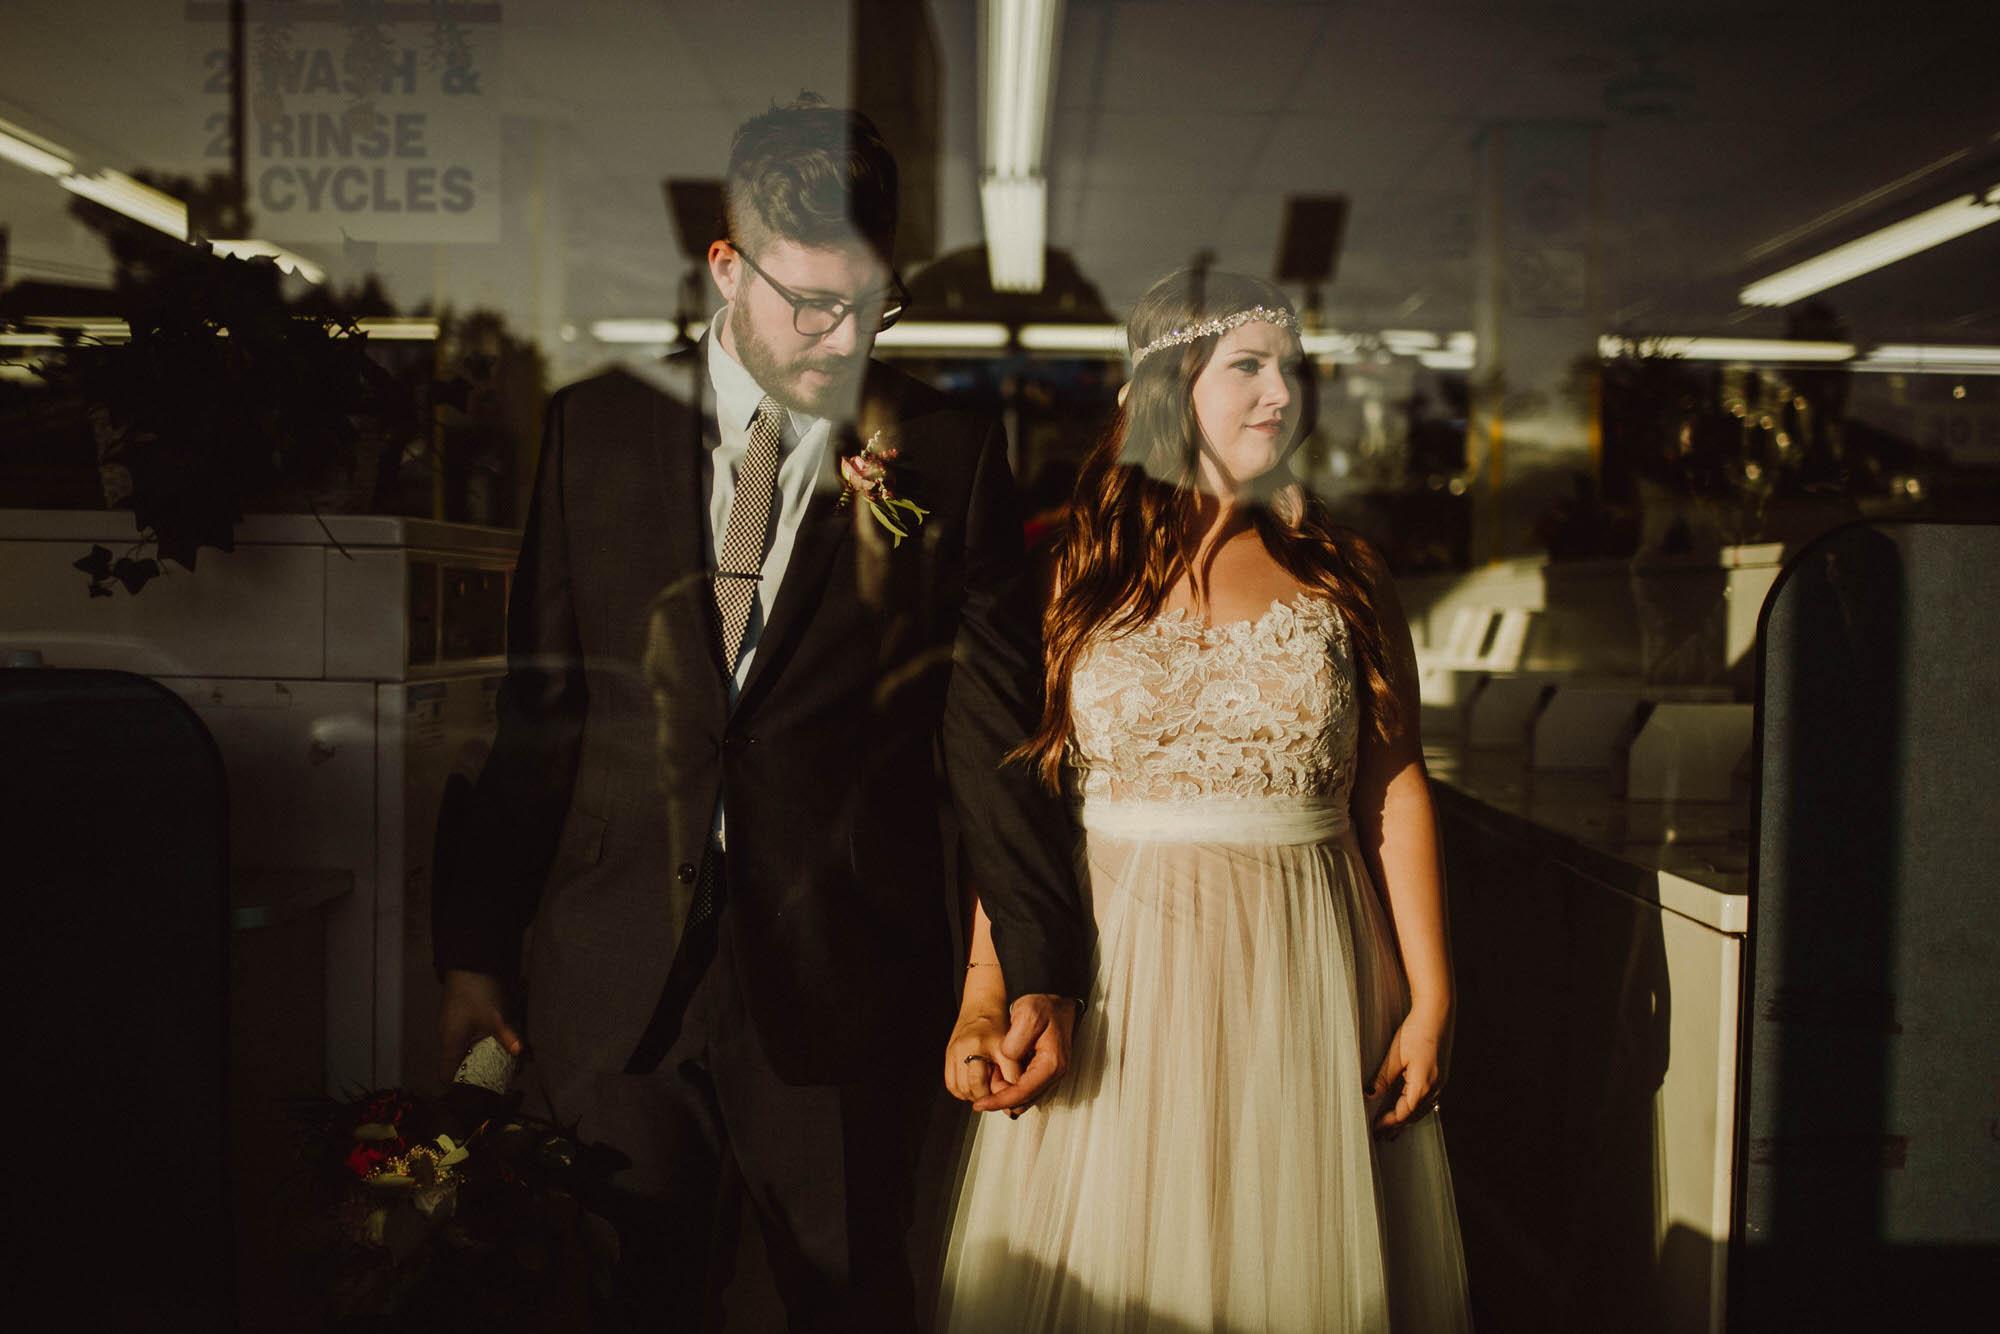 los-angeles-wedding-photographer-kristen-dylan-71.jpg